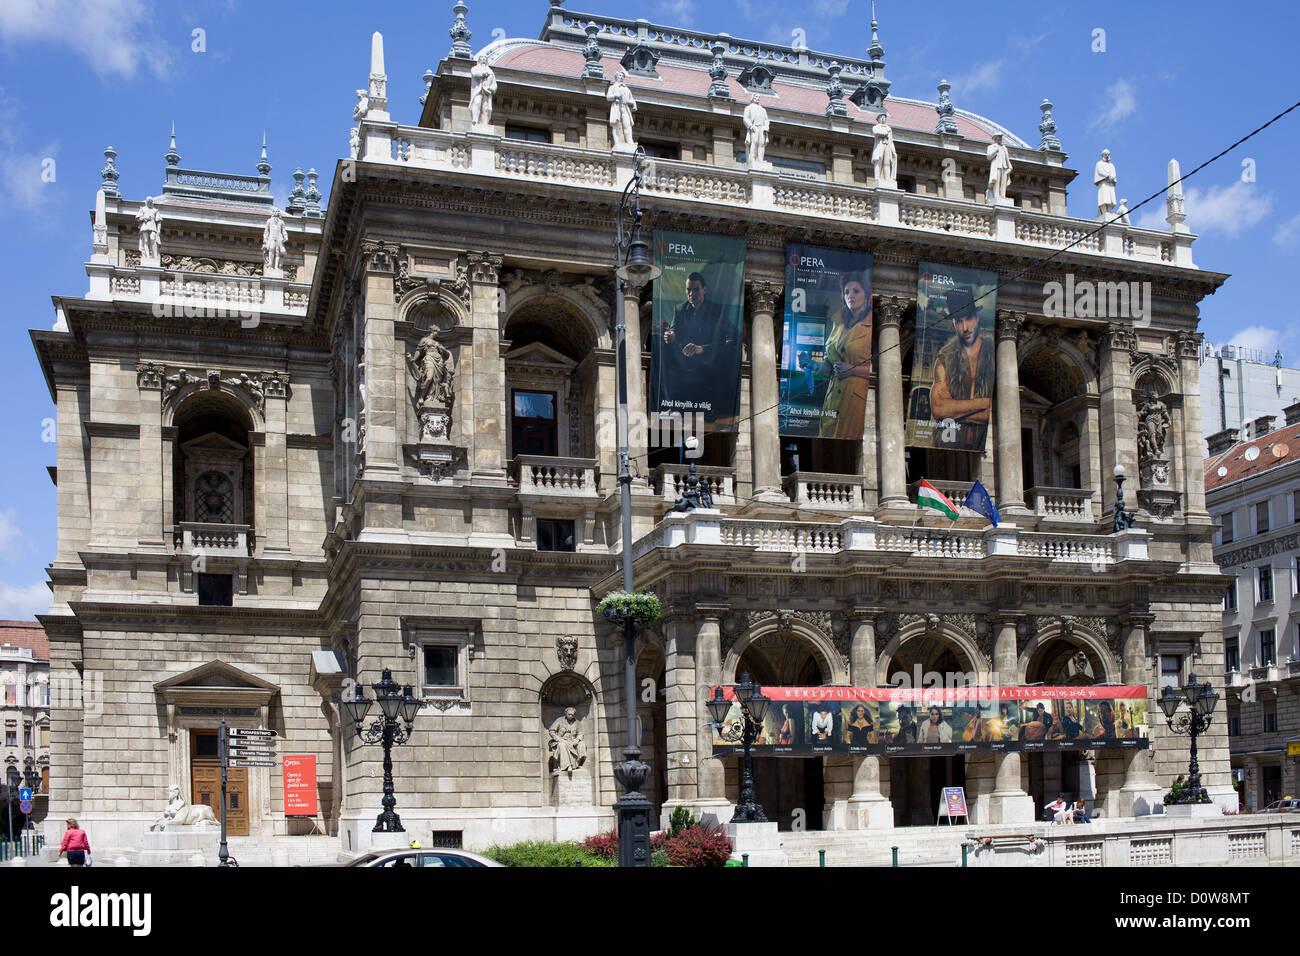 Budapest Opera House Neo-Renaissance architecture, Hungary. - Stock Image